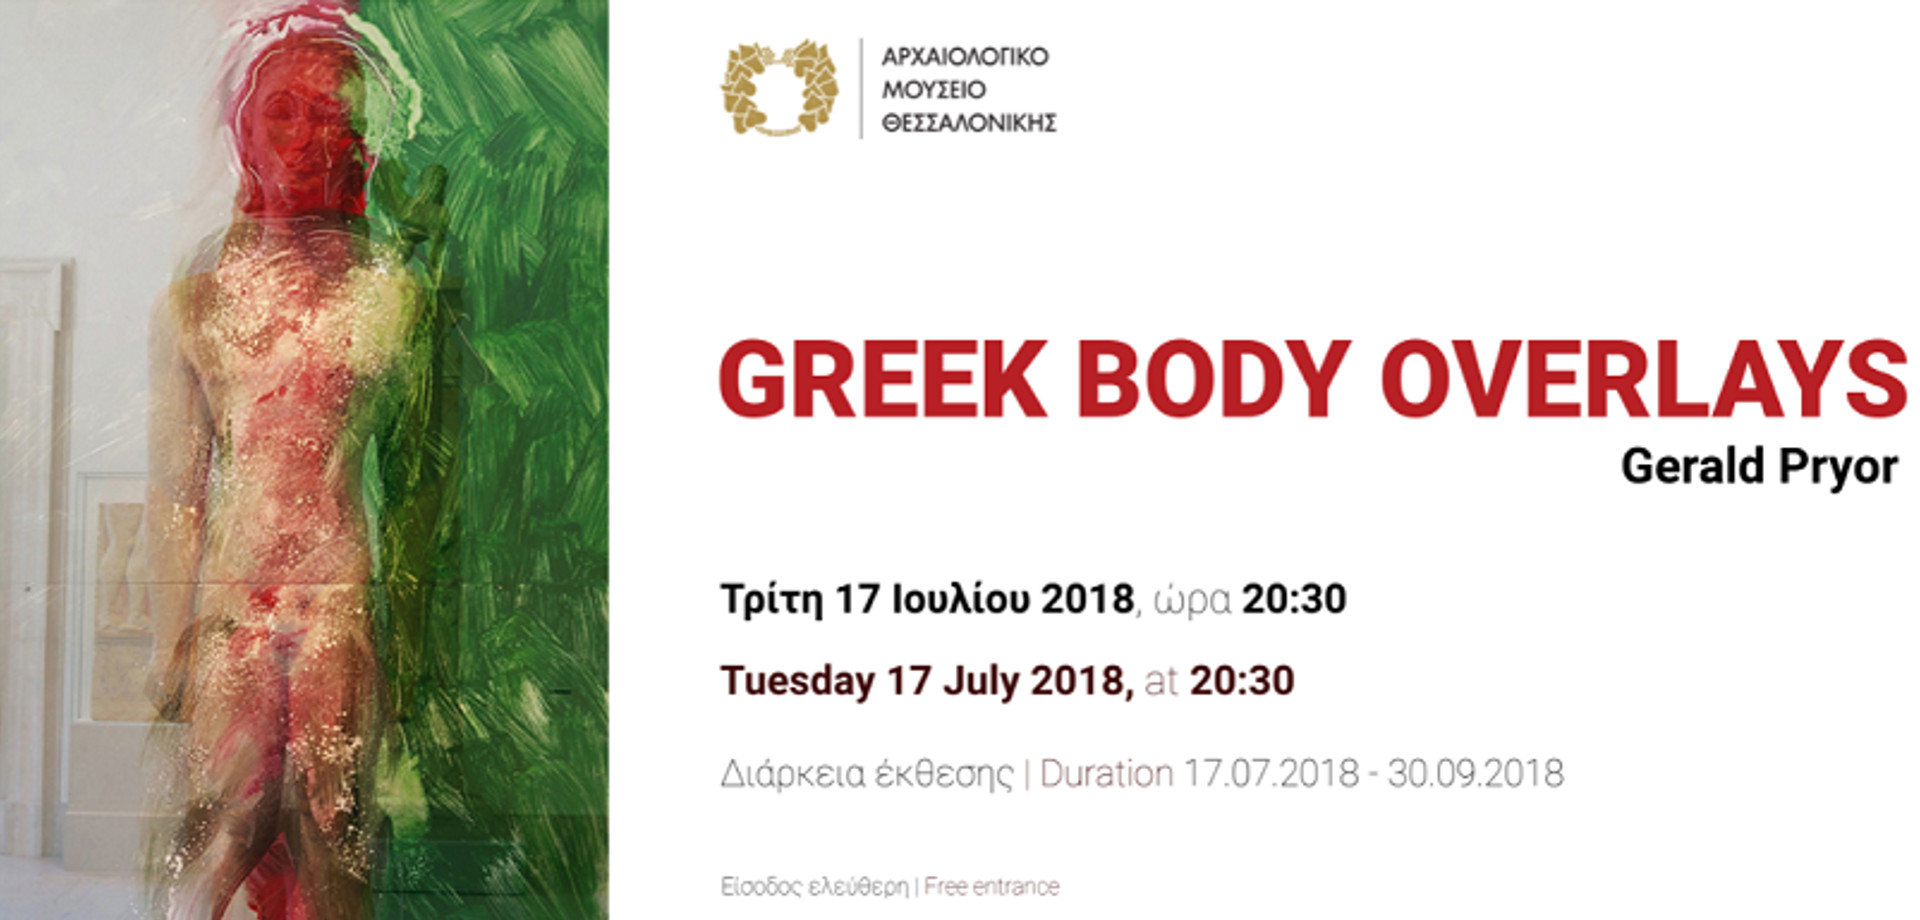 greek body overlays